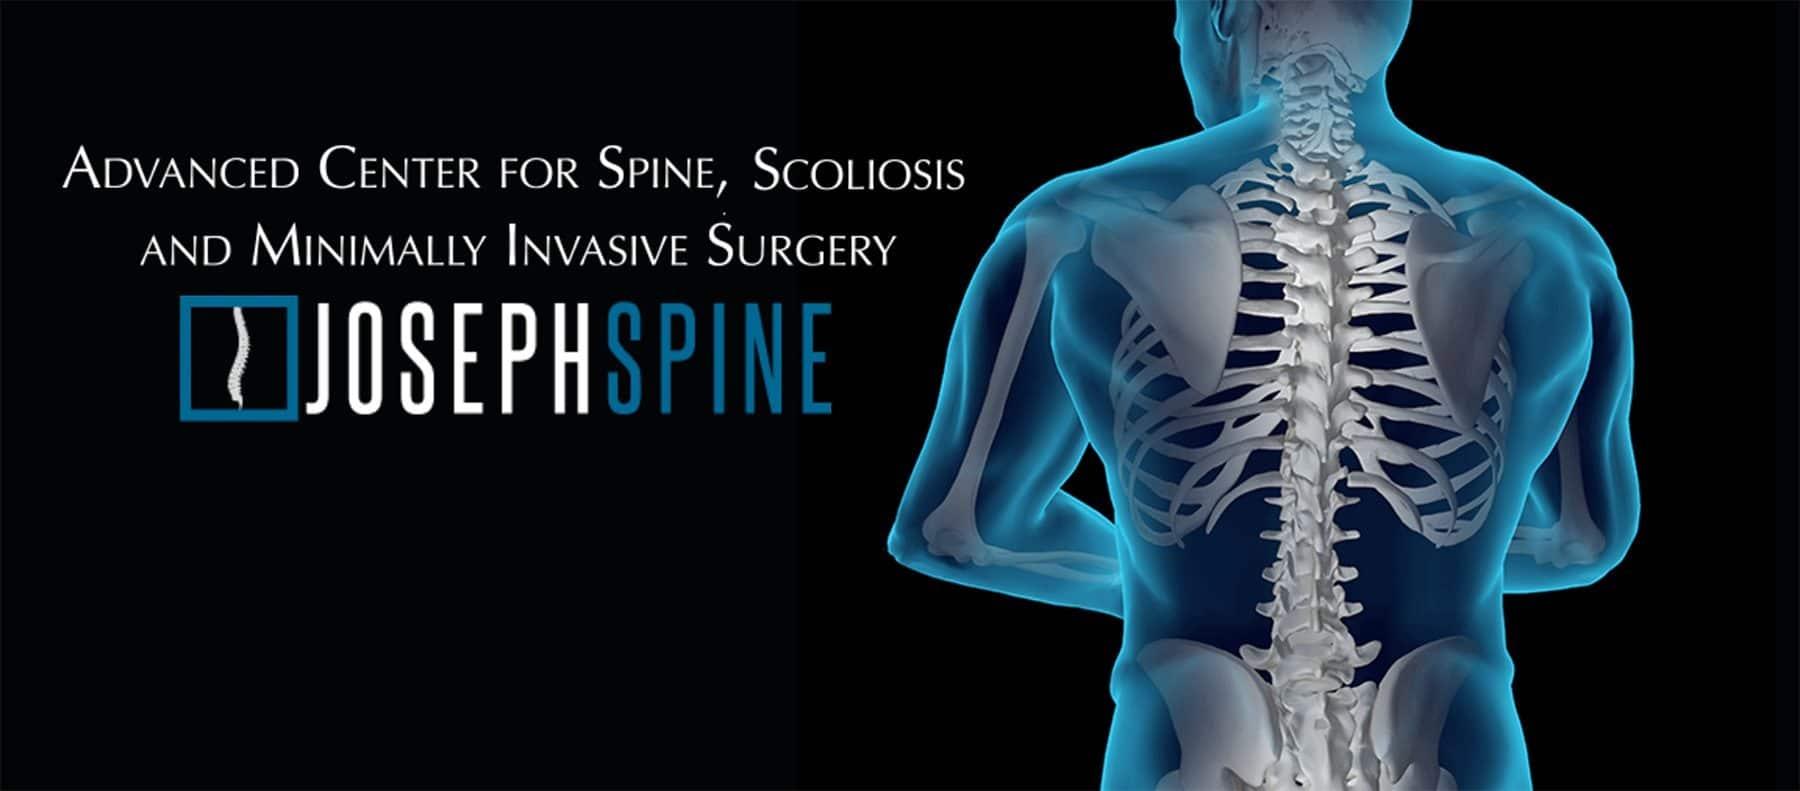 Trans Lumbar Interbody Fusion Tampa Bay Joseph Spine